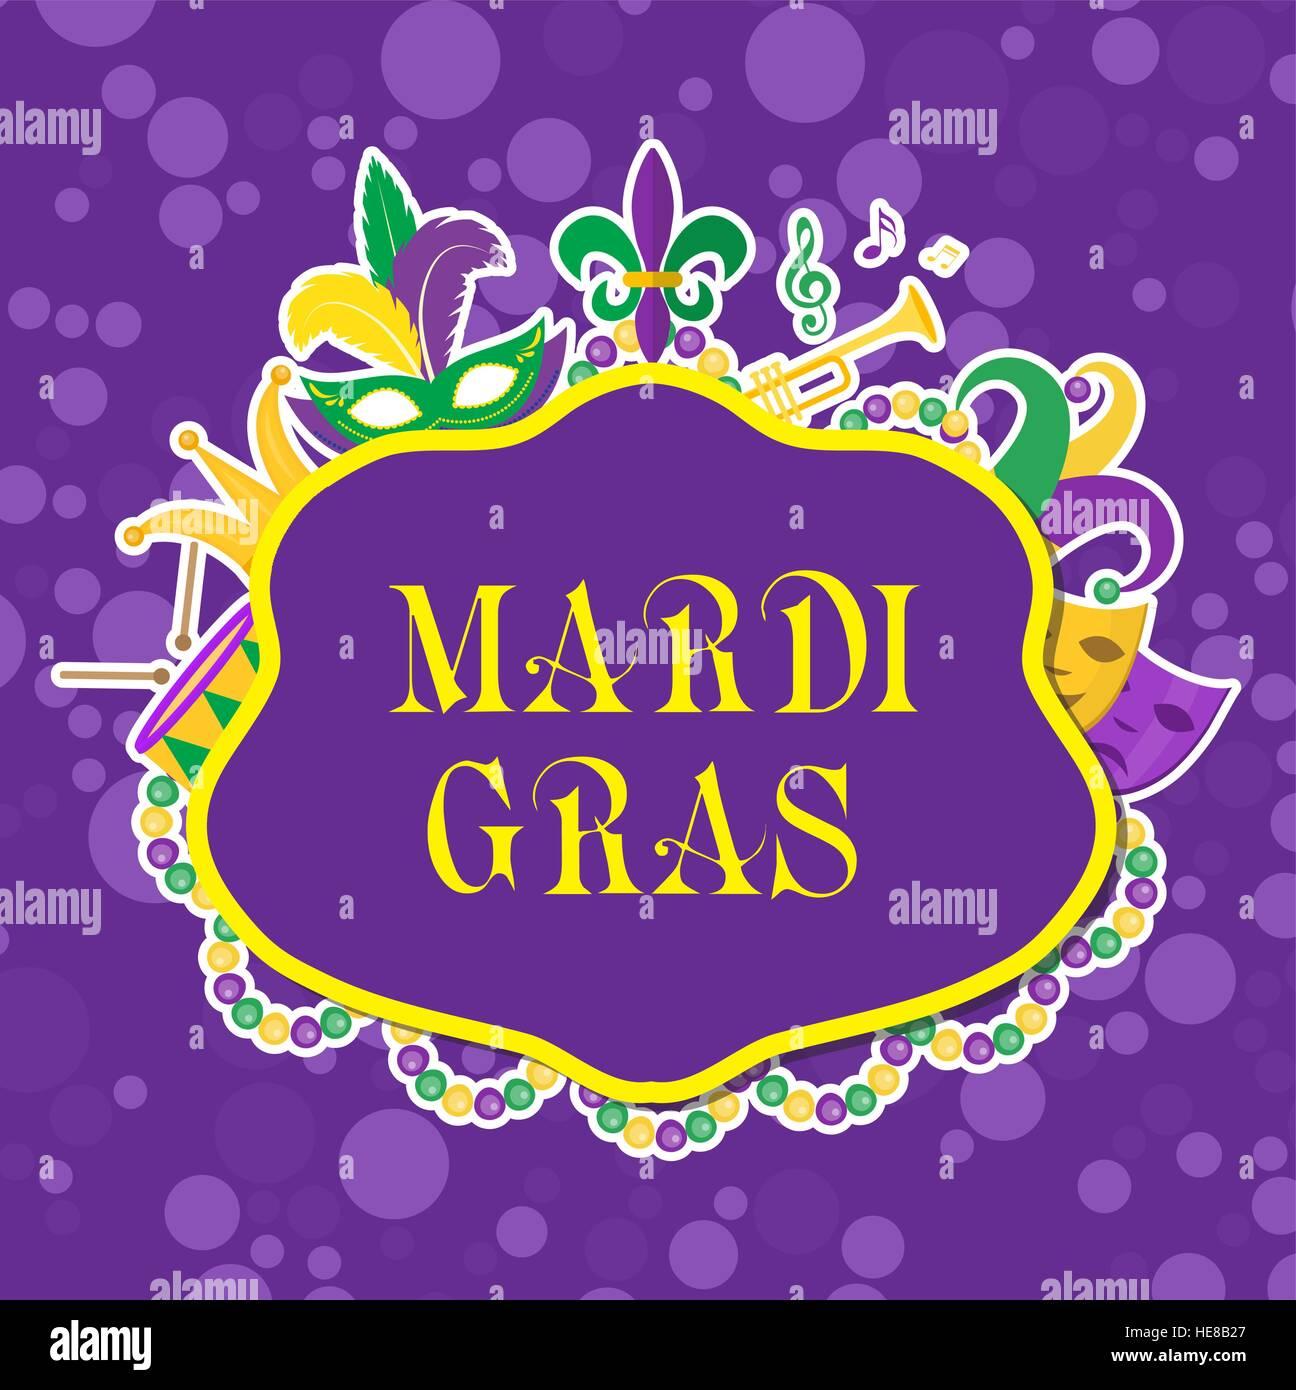 Mardi Gras Jester Hat Immagini   Mardi Gras Jester Hat Fotos Stock ... 4413fececcf4